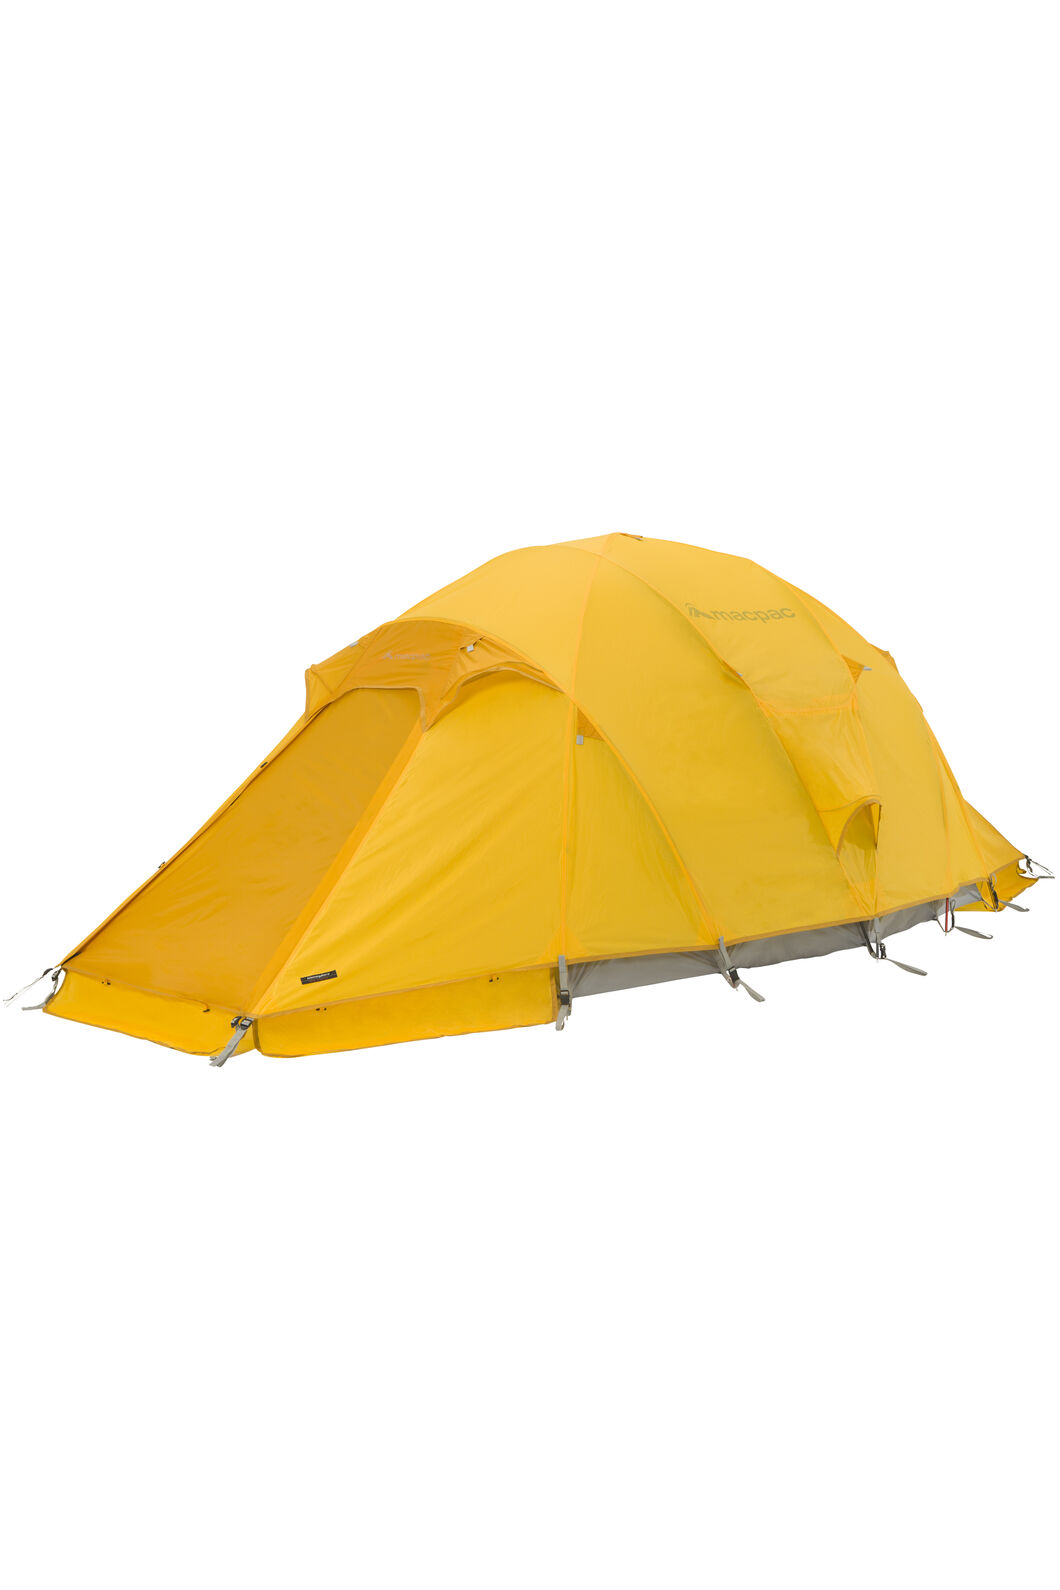 Macpac Hemisphere Alpine Tent, Spectra Yellow, hi-res